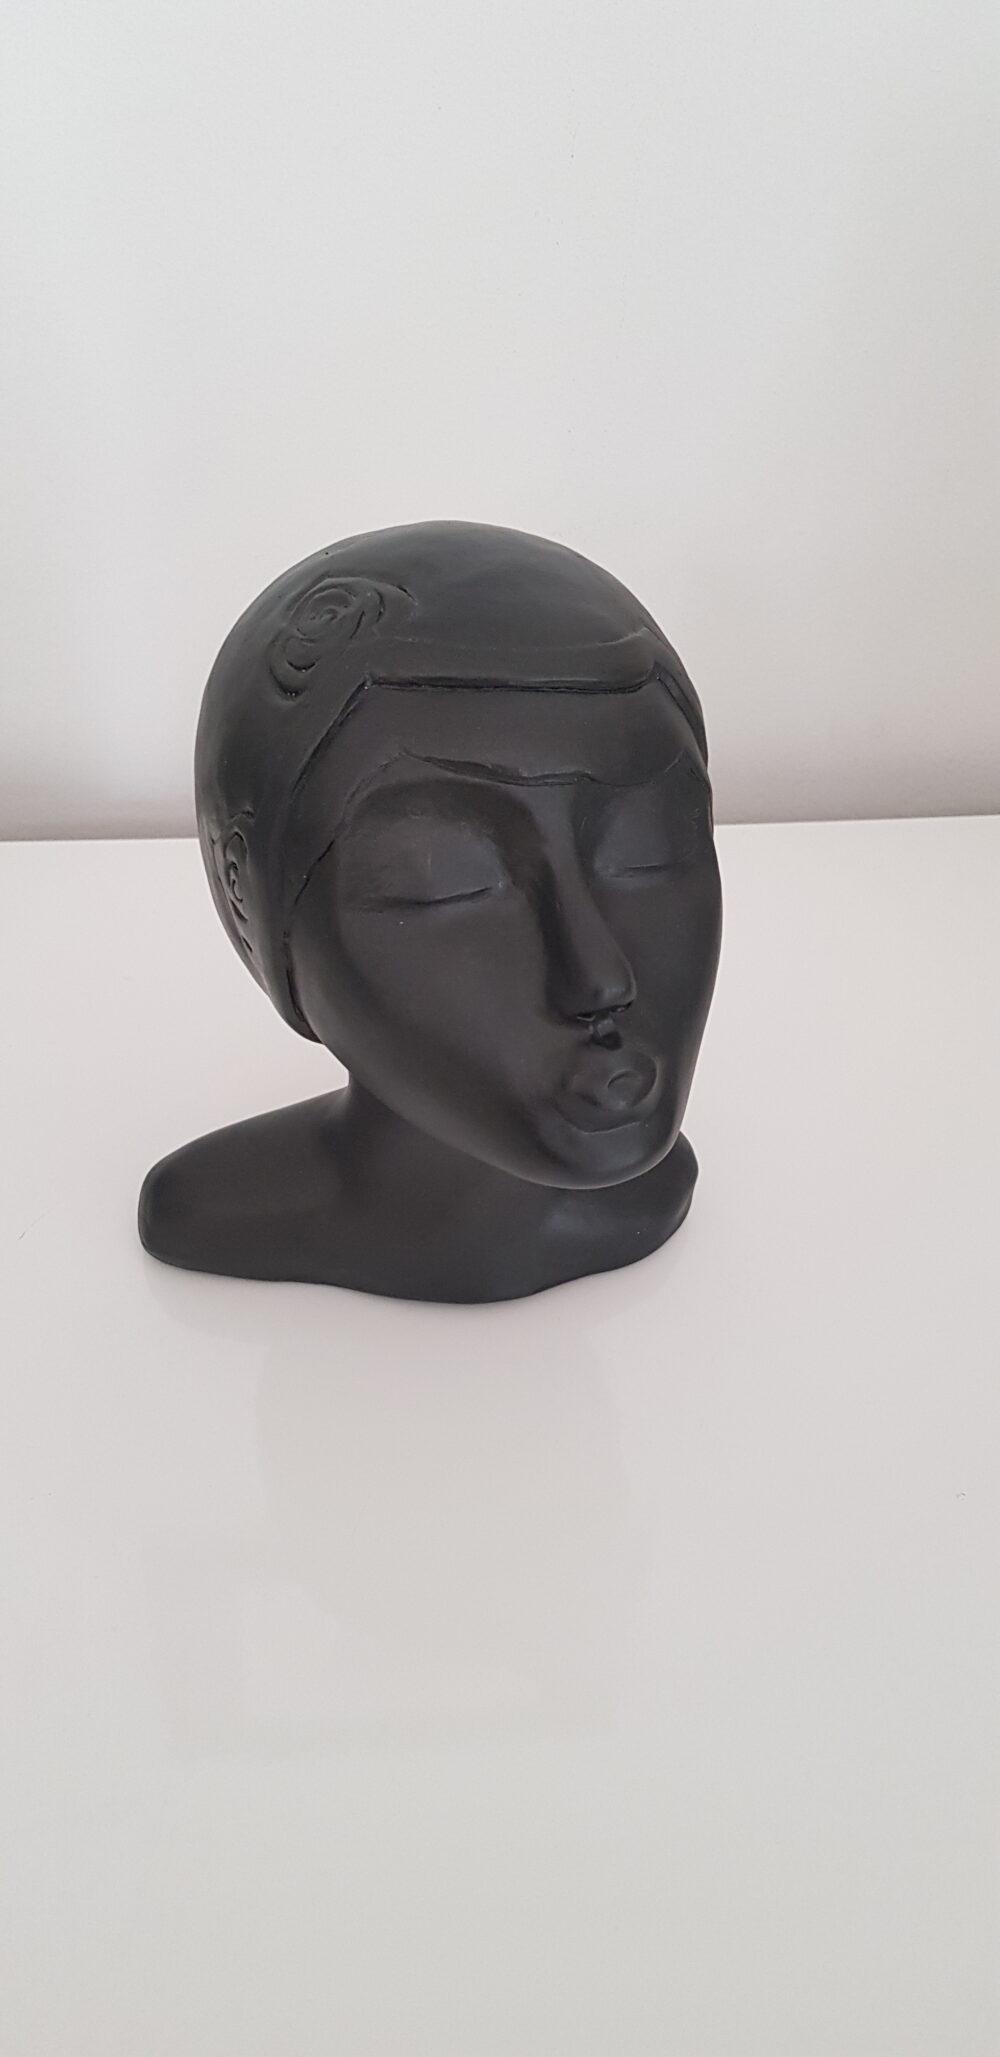 venus d'ébène sylvie Antoniotti galerie Bel'arti